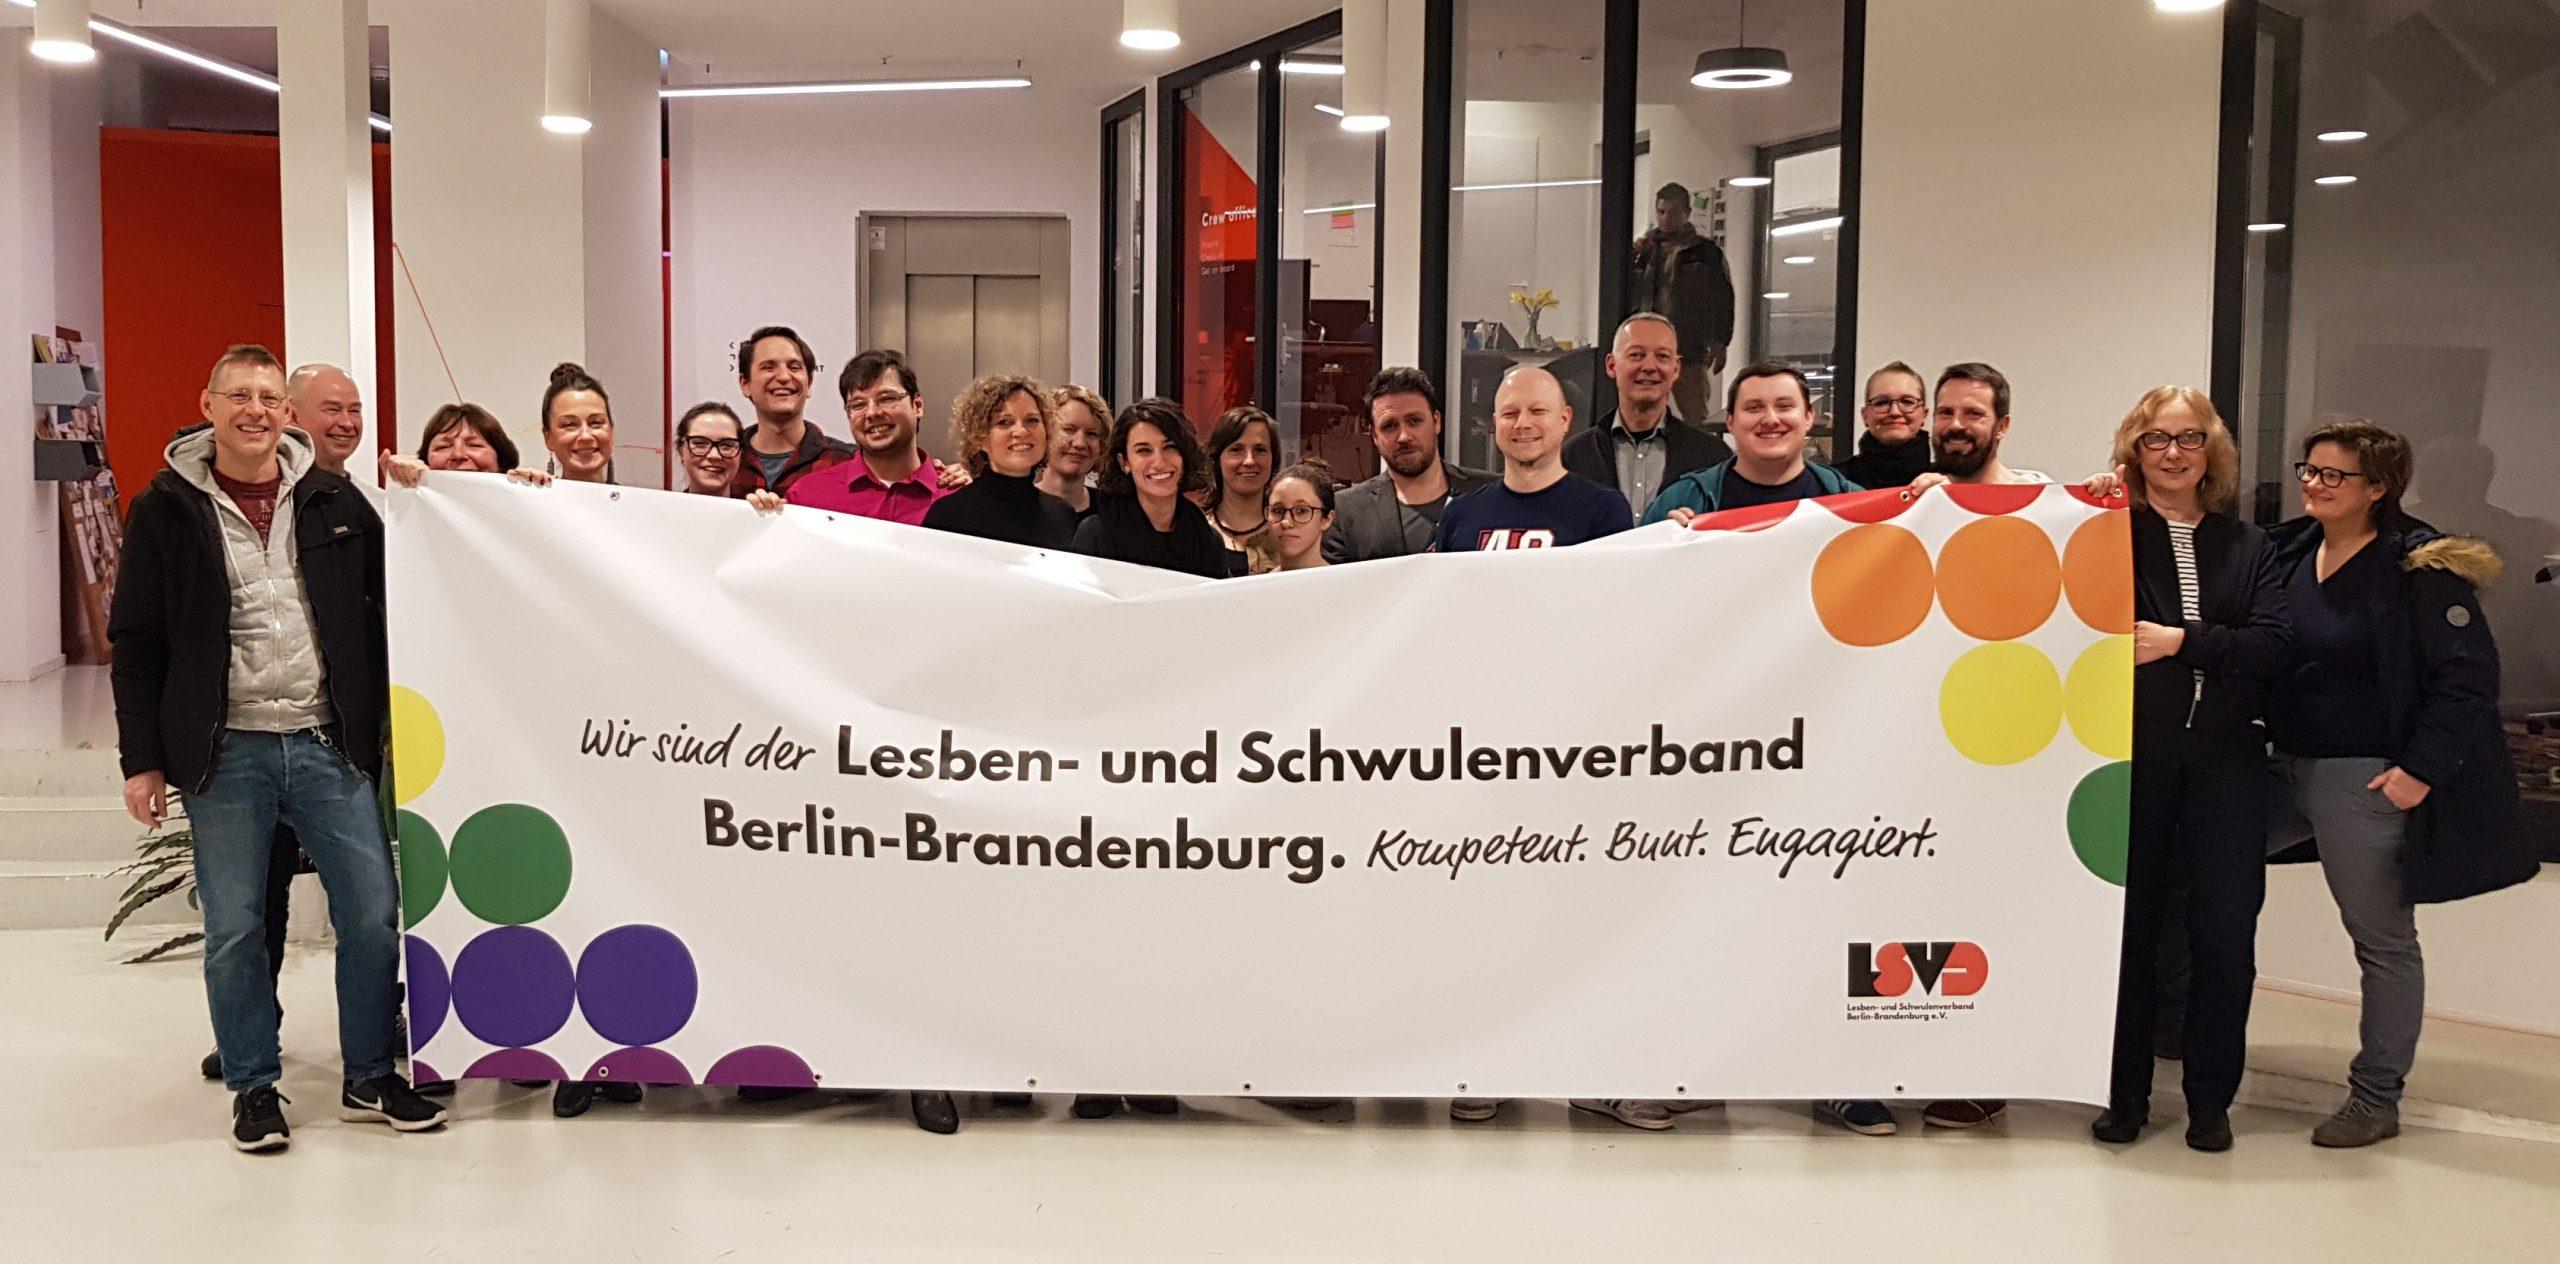 Stellenausschreibung  Lsvd Berlinbrandenburg  Lsvd